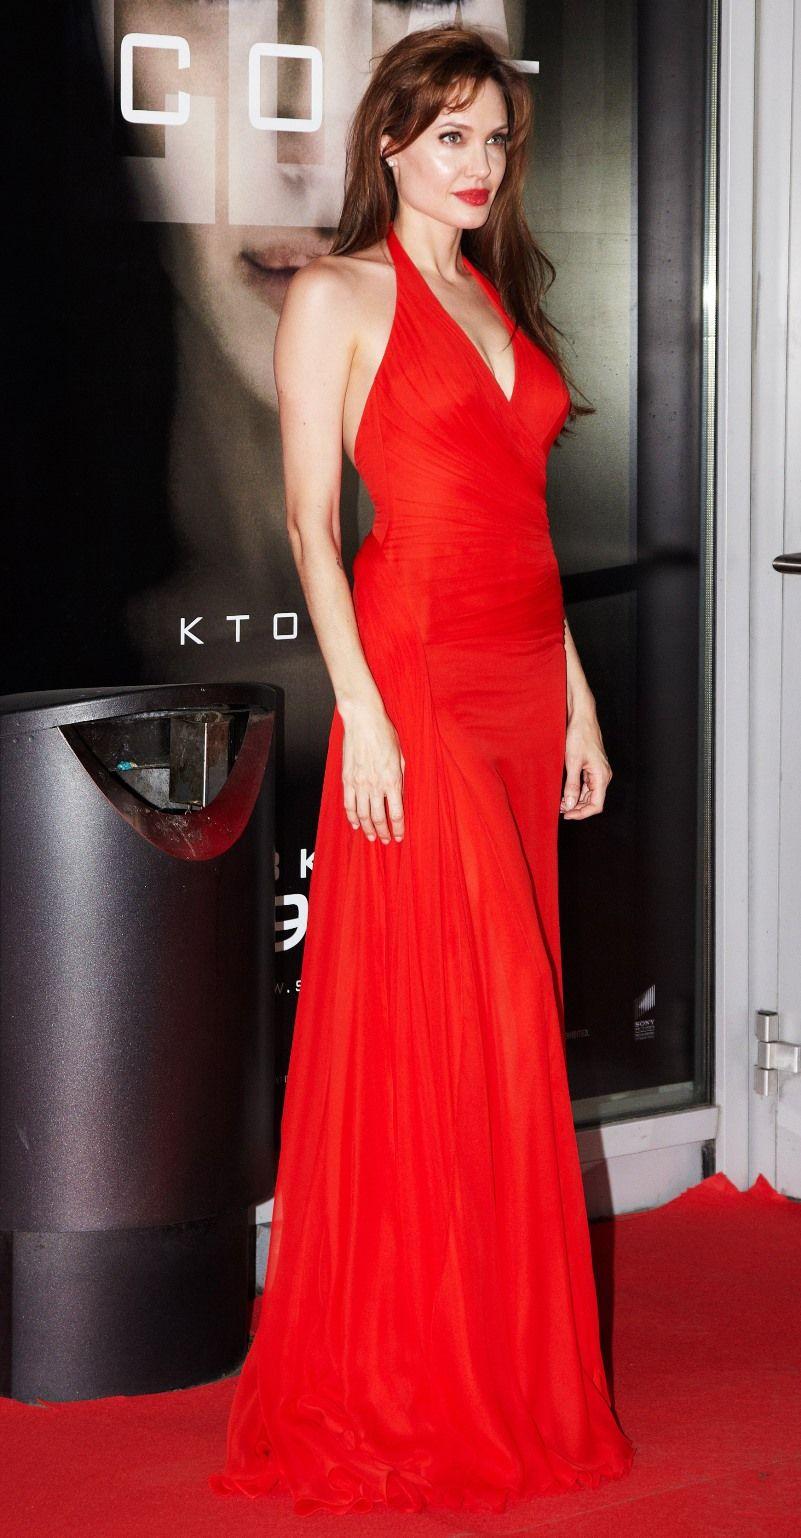 Pin By Erika Saiza On Fashion Hollywood Gowns Fashion